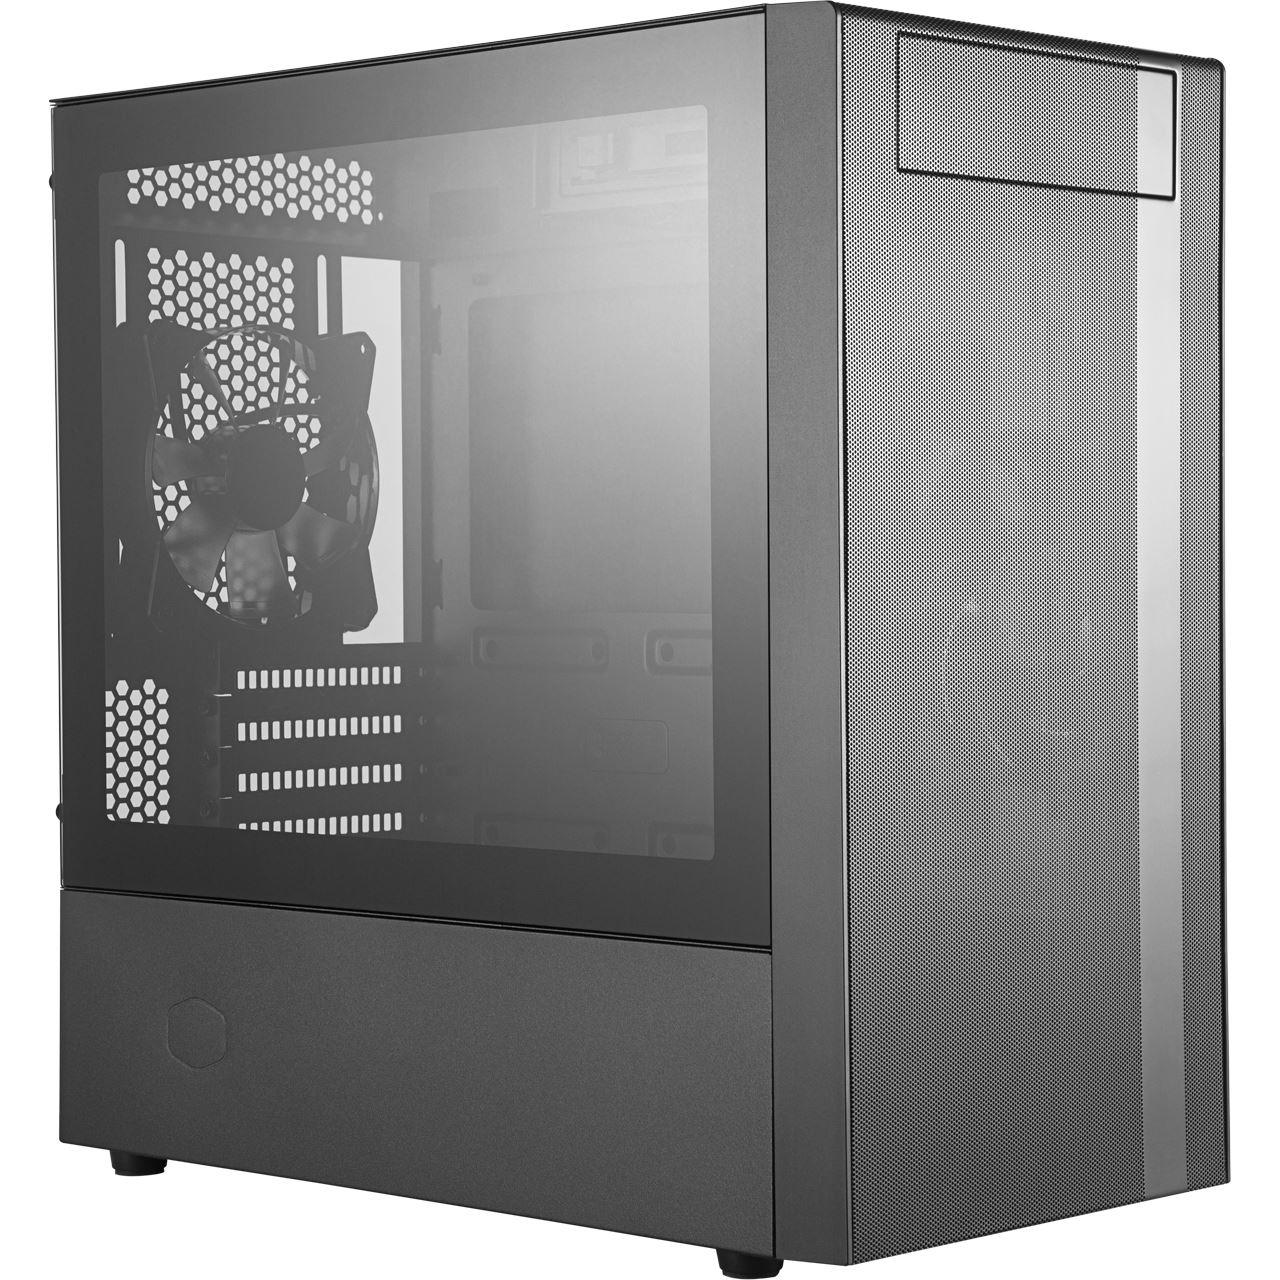 869-AMD